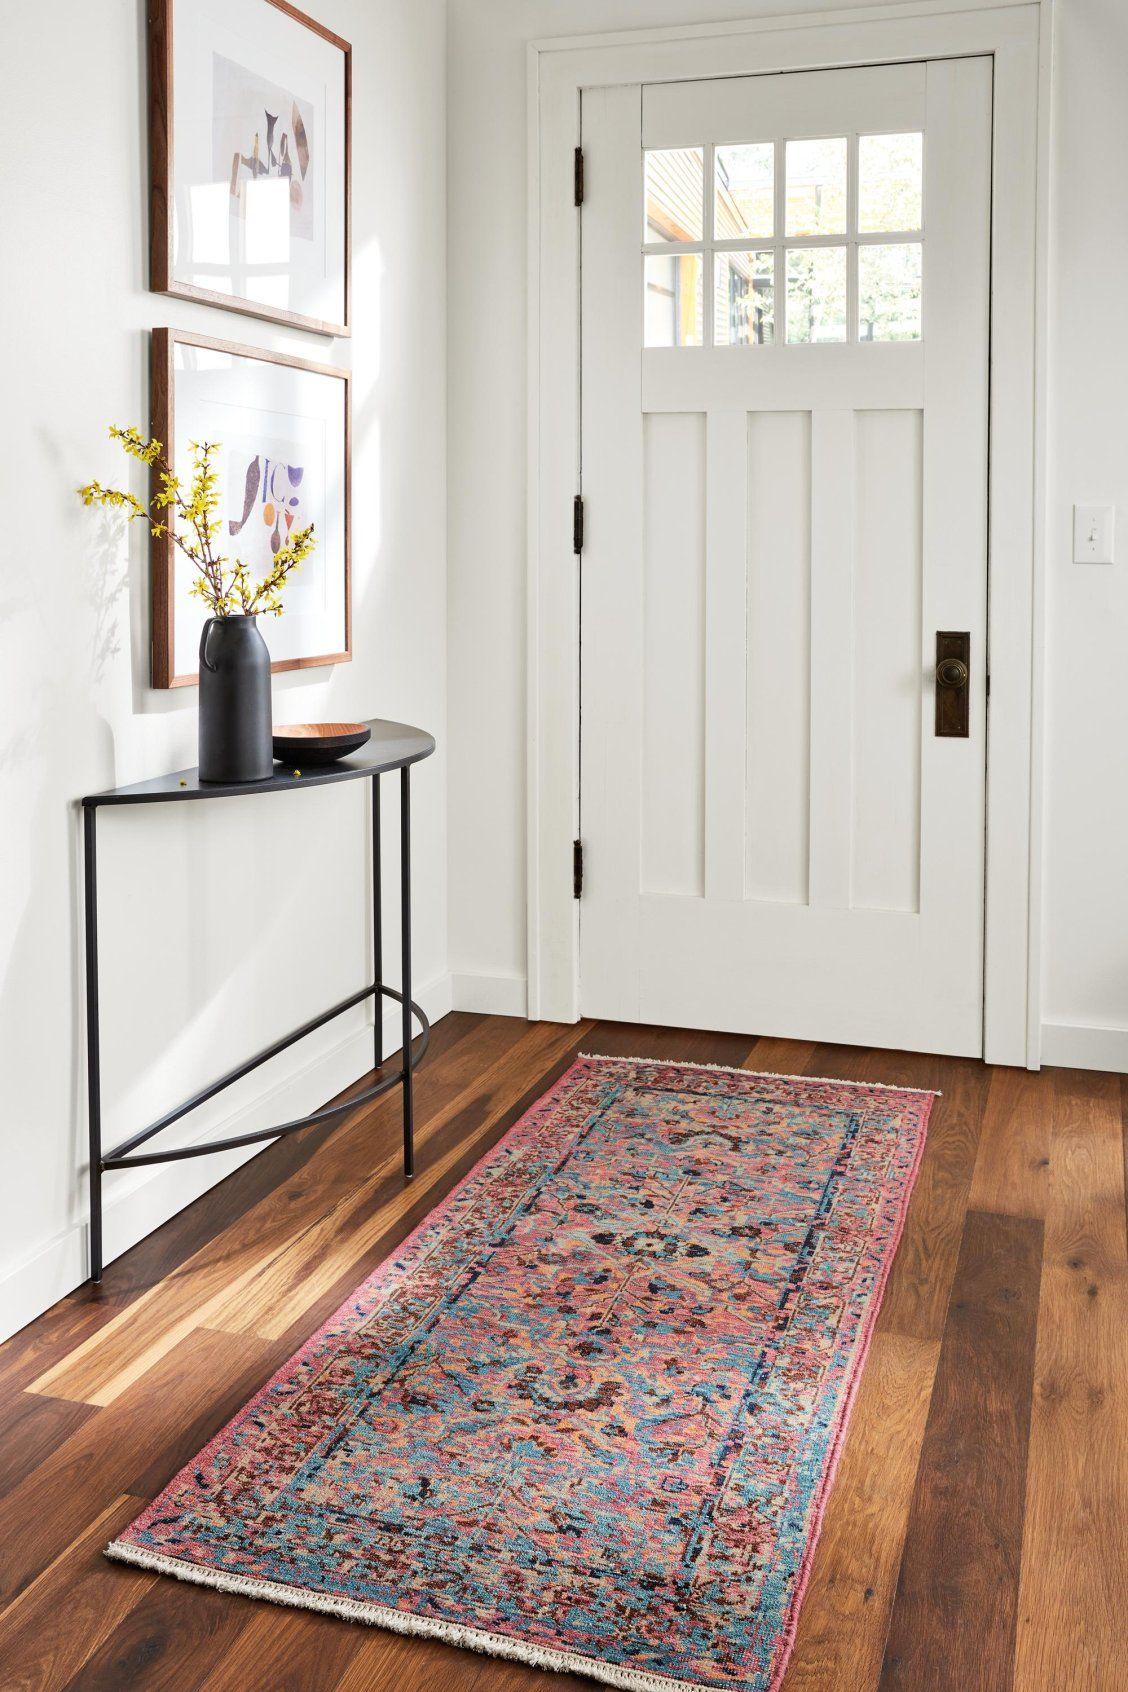 Room & Board - Slim Half-Round Console Tables - Modern Console Tables - Modern Living Room Furniture